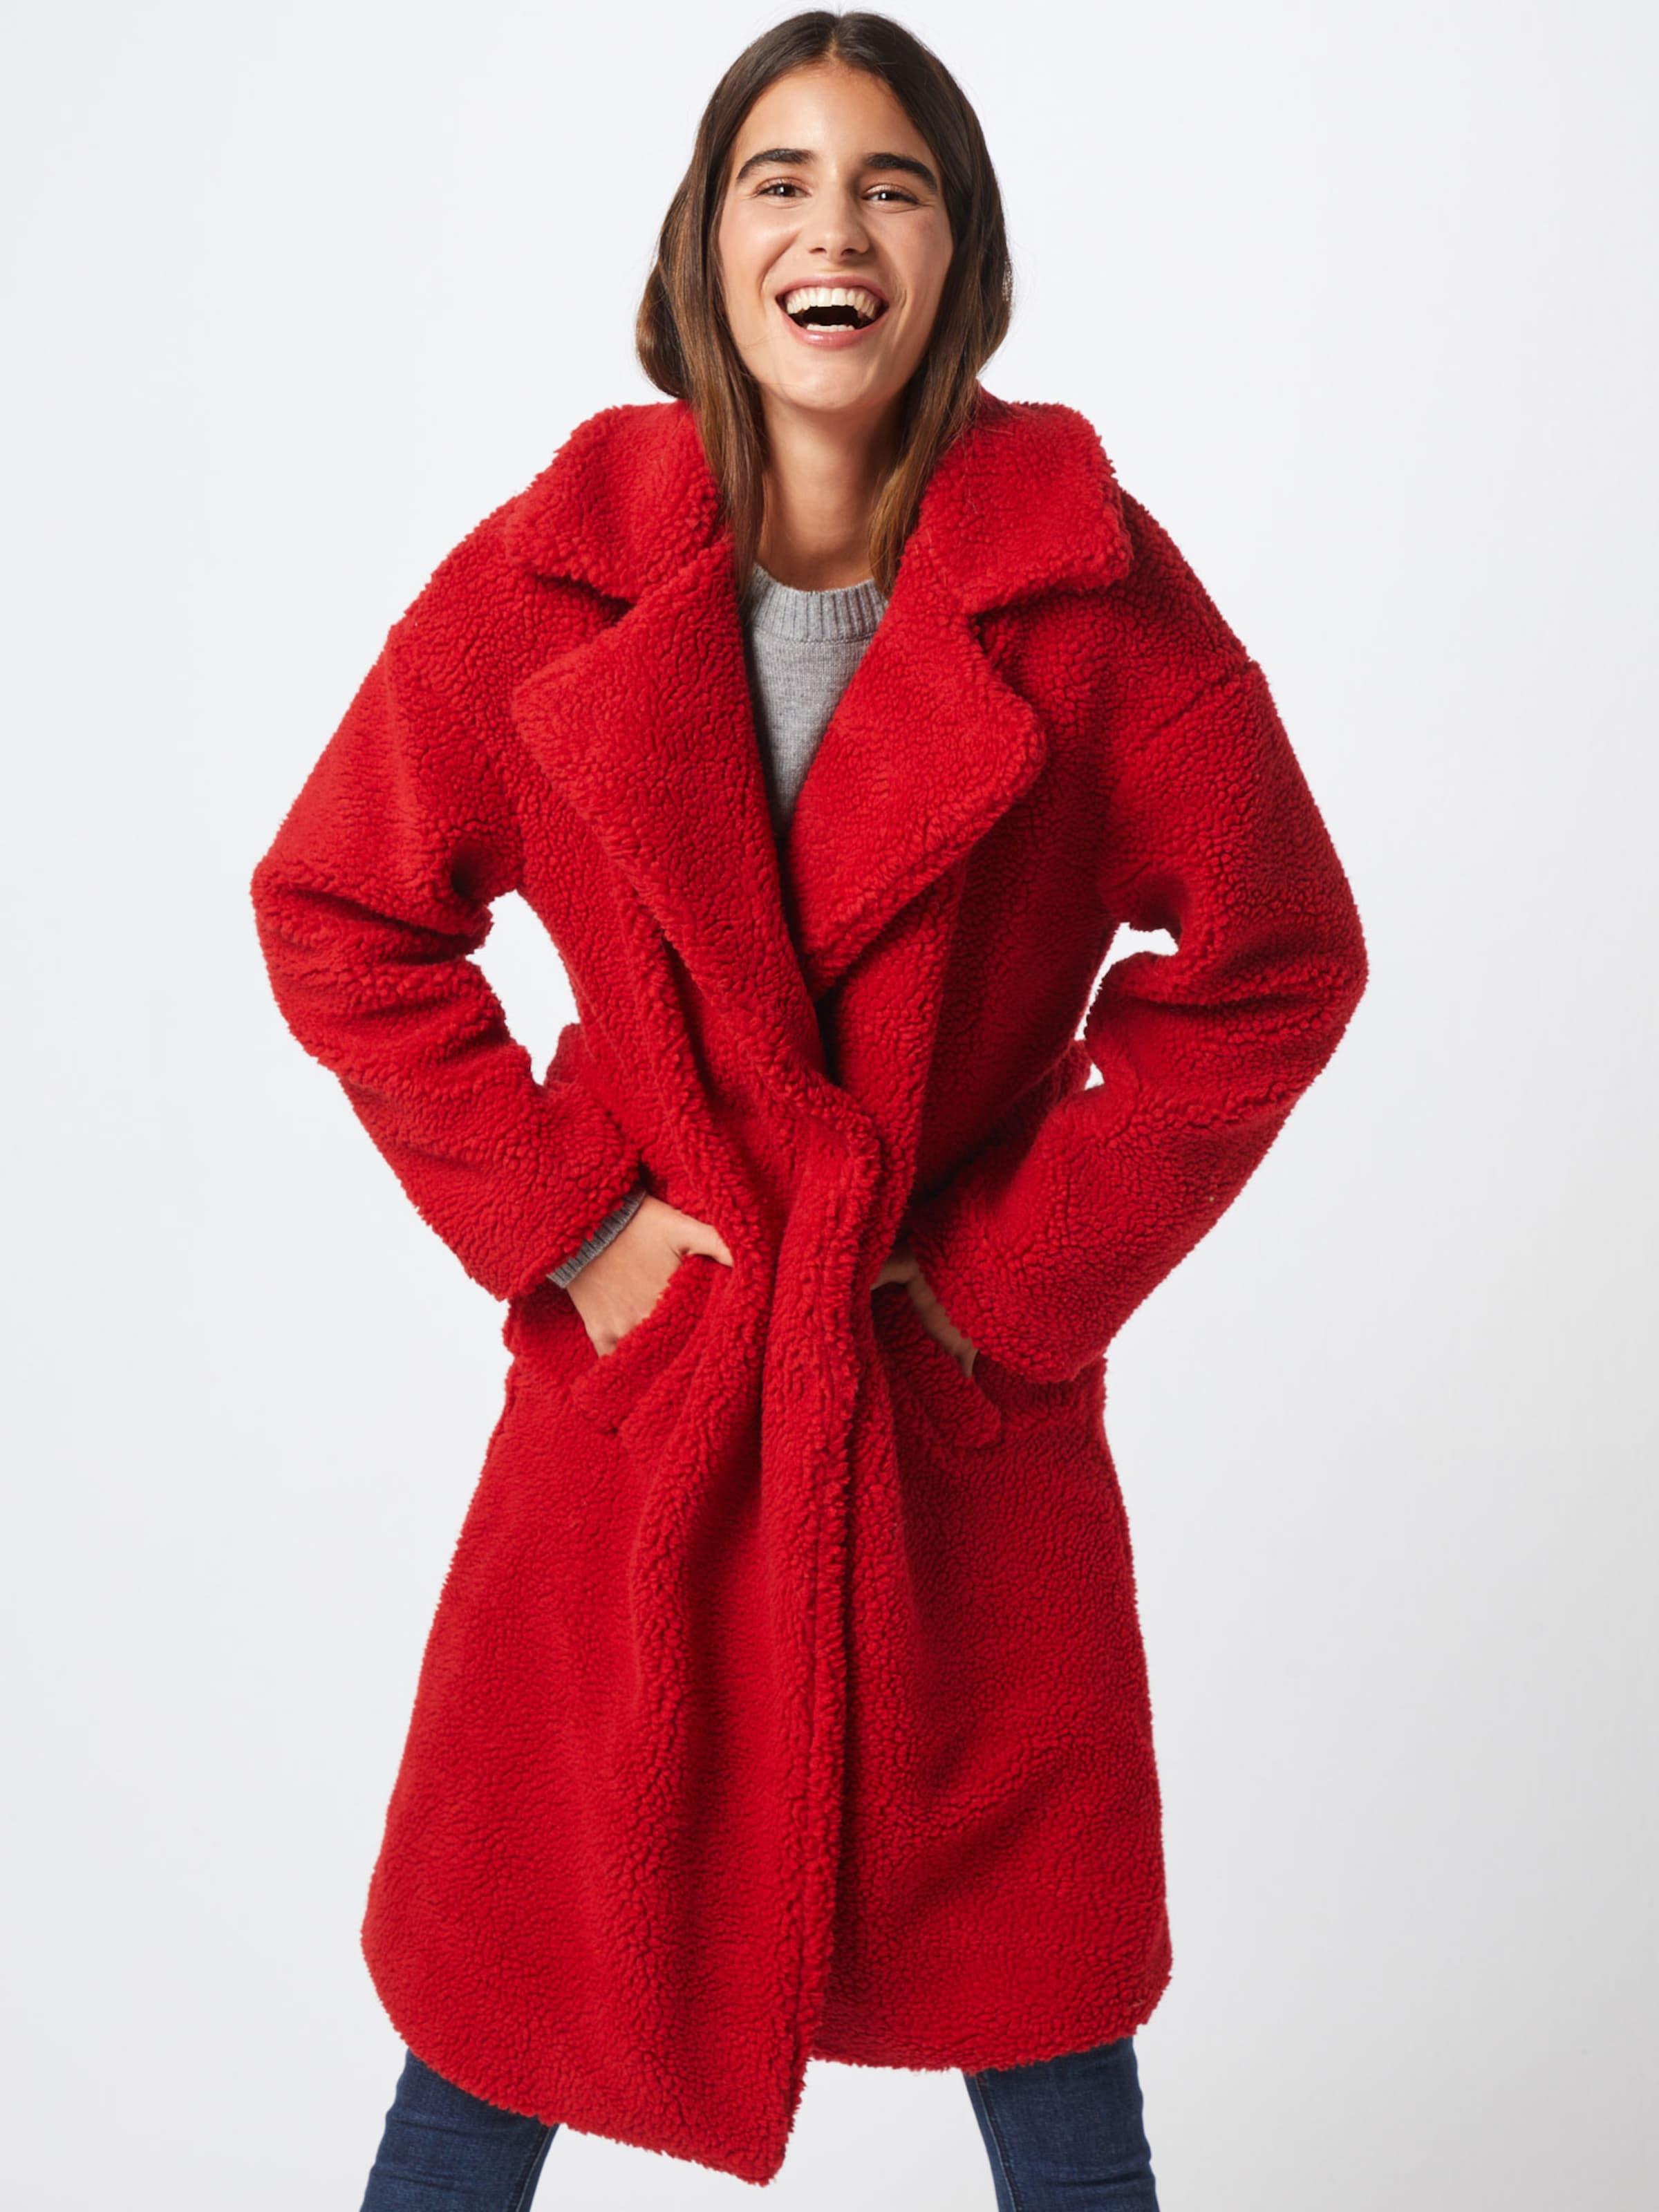 Manteau Coat' En Na kd Rouge 'teddy D'hiver zqMGSpUV